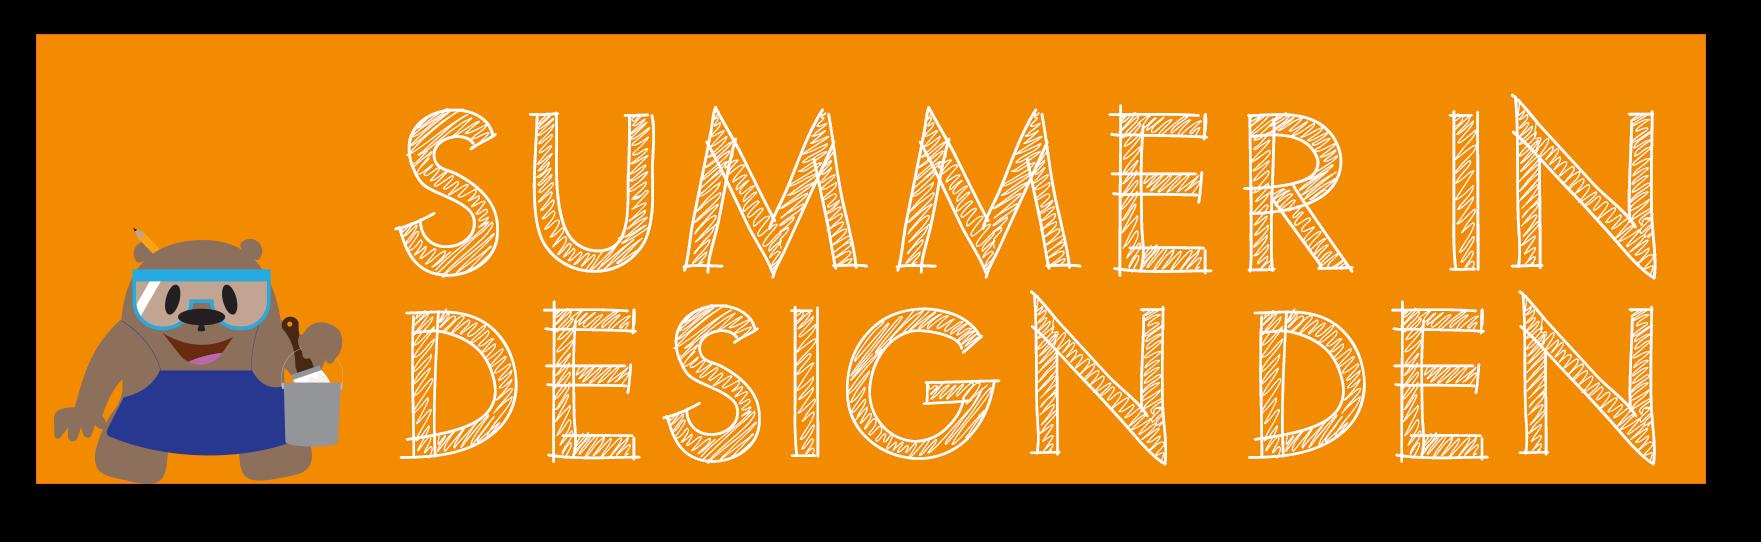 Design Den Summer Page 6